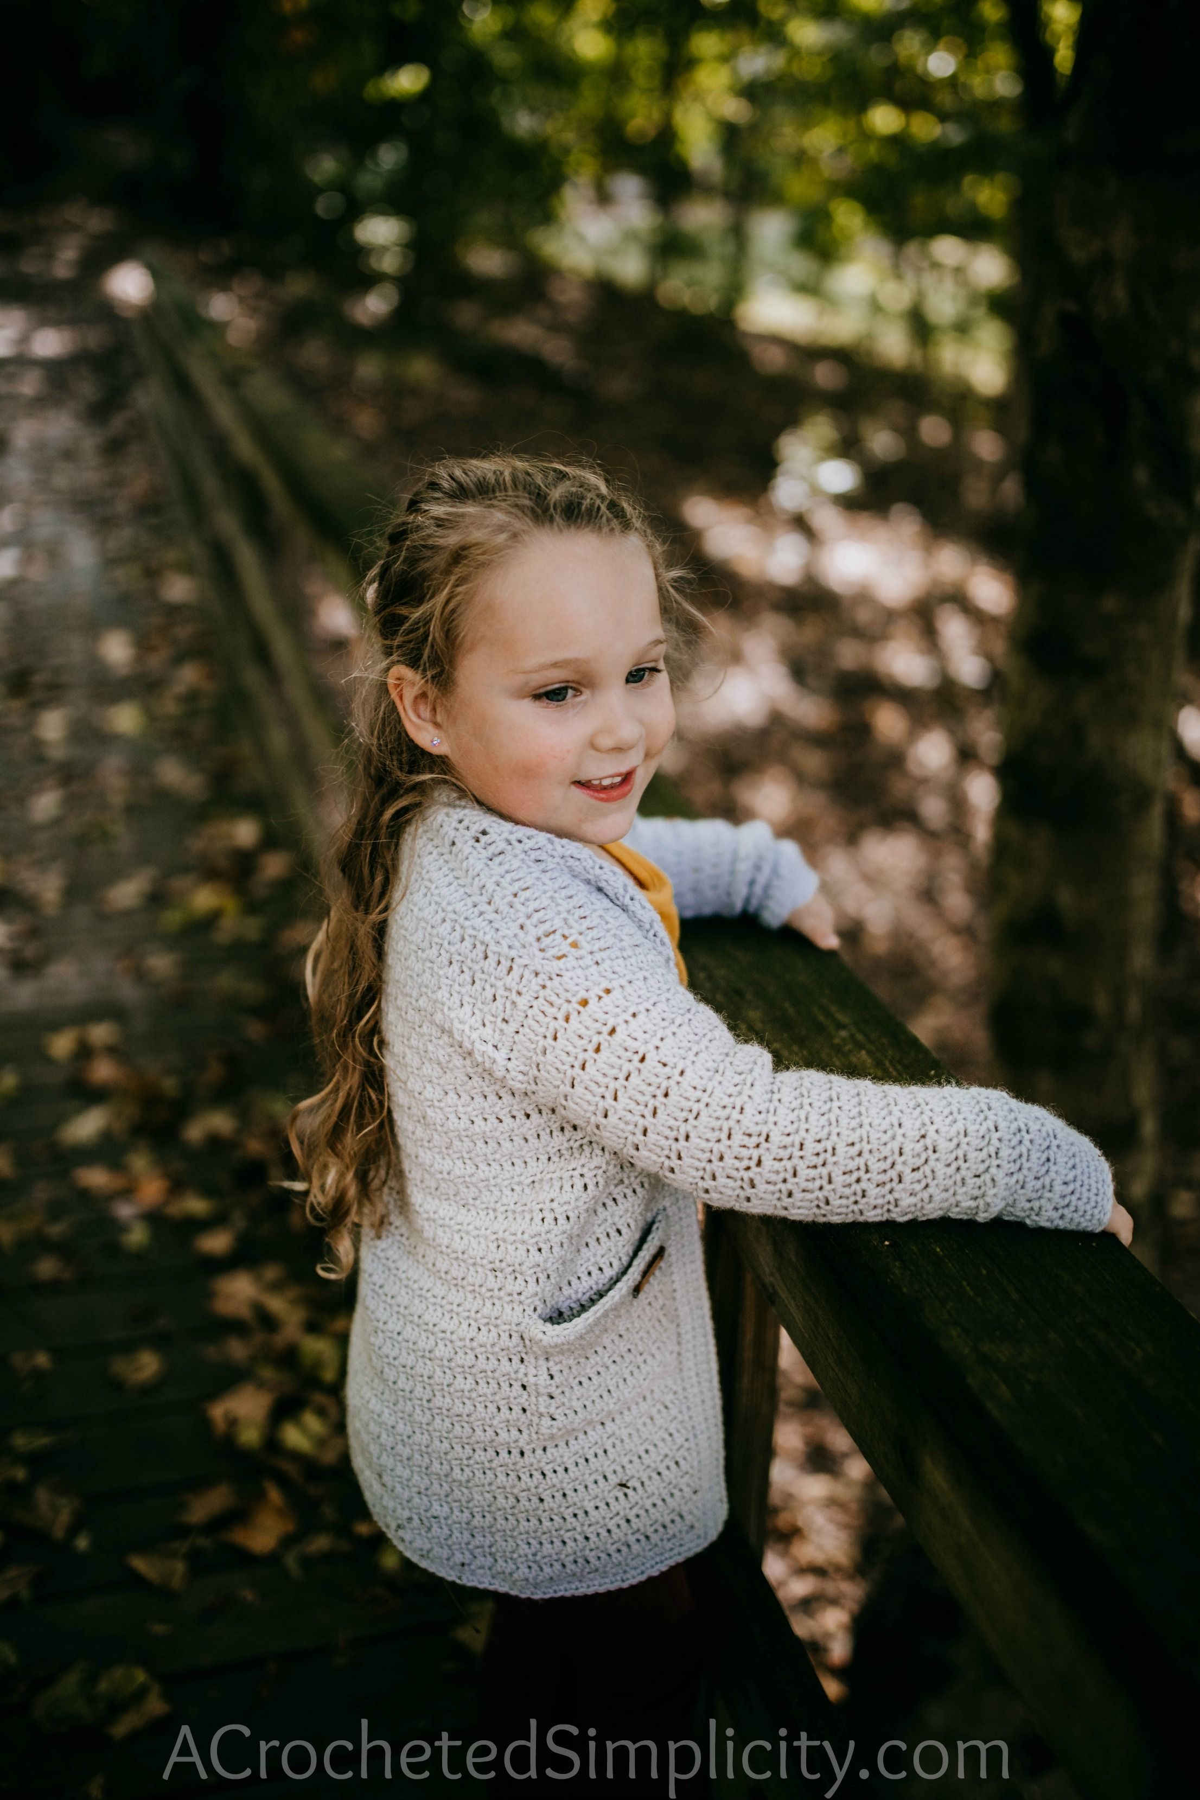 Free Crochet Cardigan Pattern - Aurora Cardigan for Girls by A Crocheted Simplicity #crochet #crochetcardigan #crochetcardiganpattern #freecrochetpattern #crochetsweater #crochetgirlscardigan #handmadecardigan #homemade